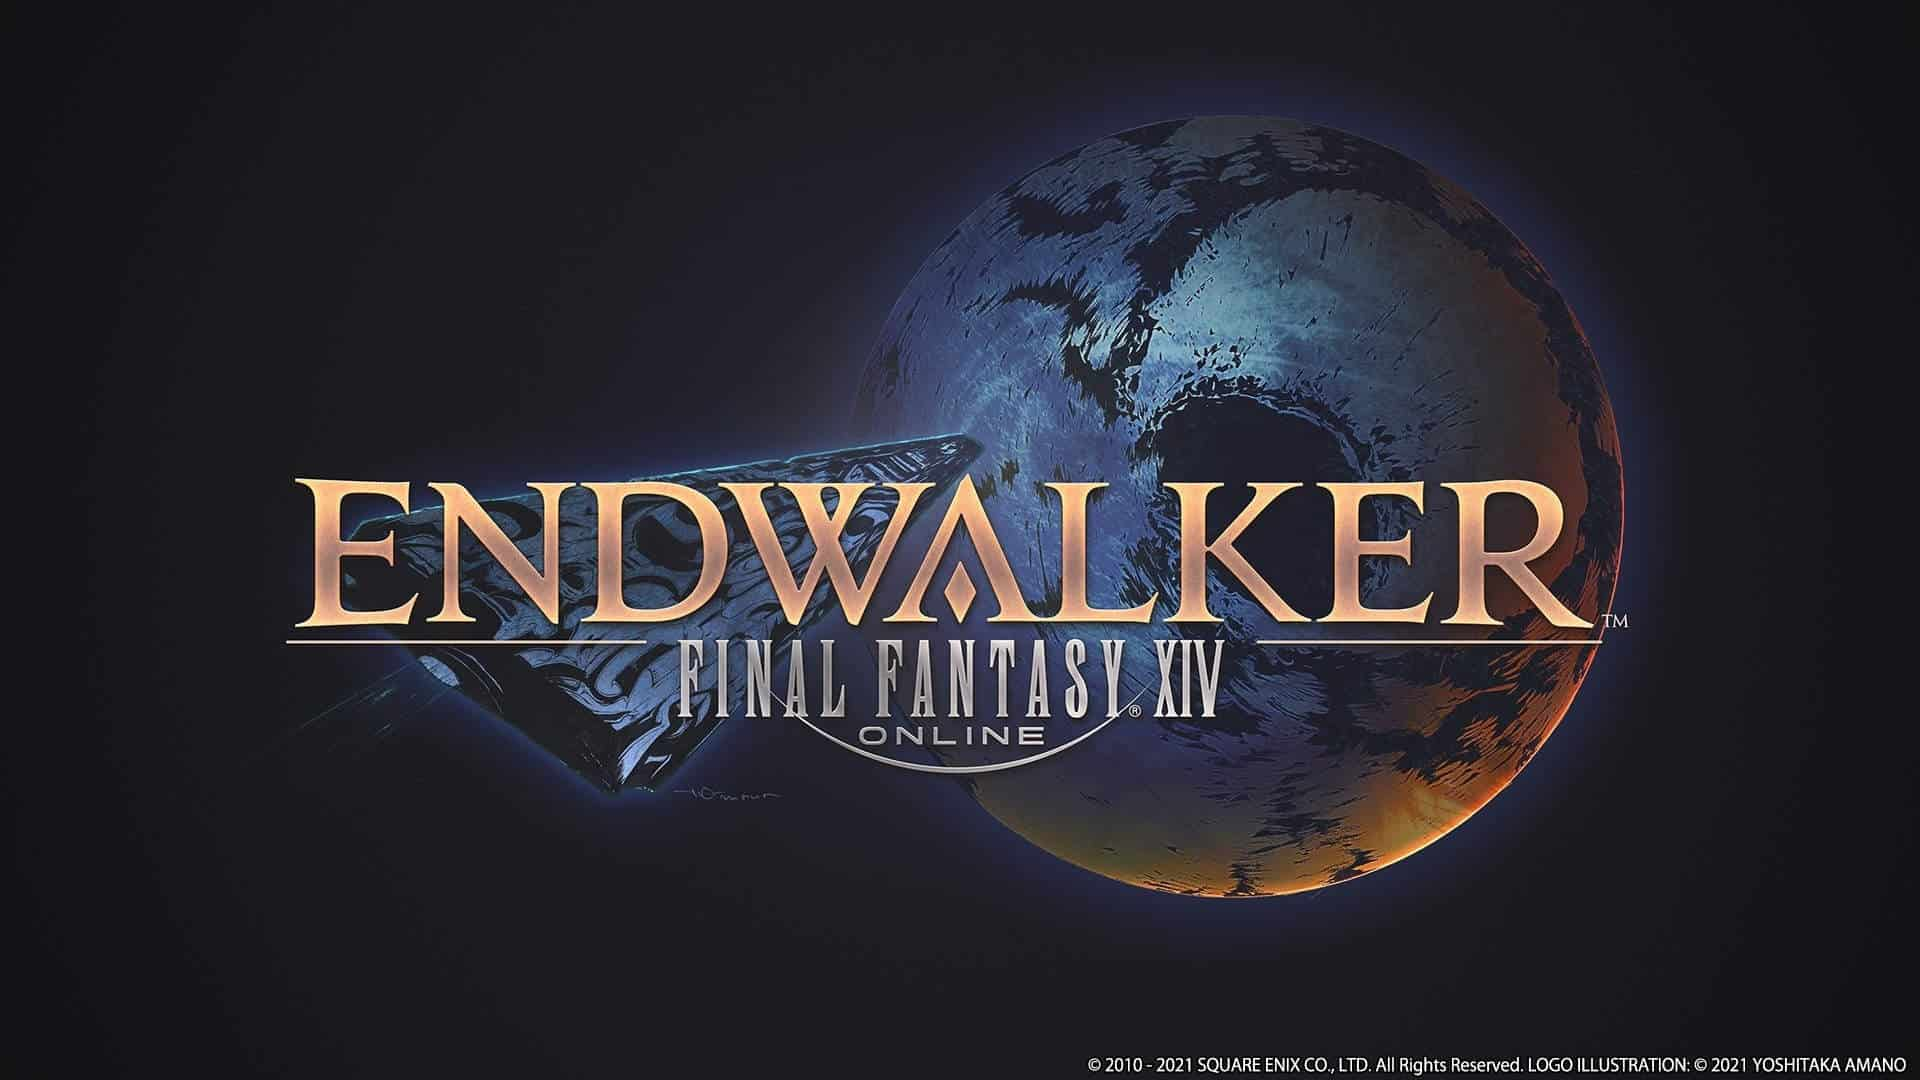 Final Fantasy XIV Endwalker - NEw Expansion Announced 1